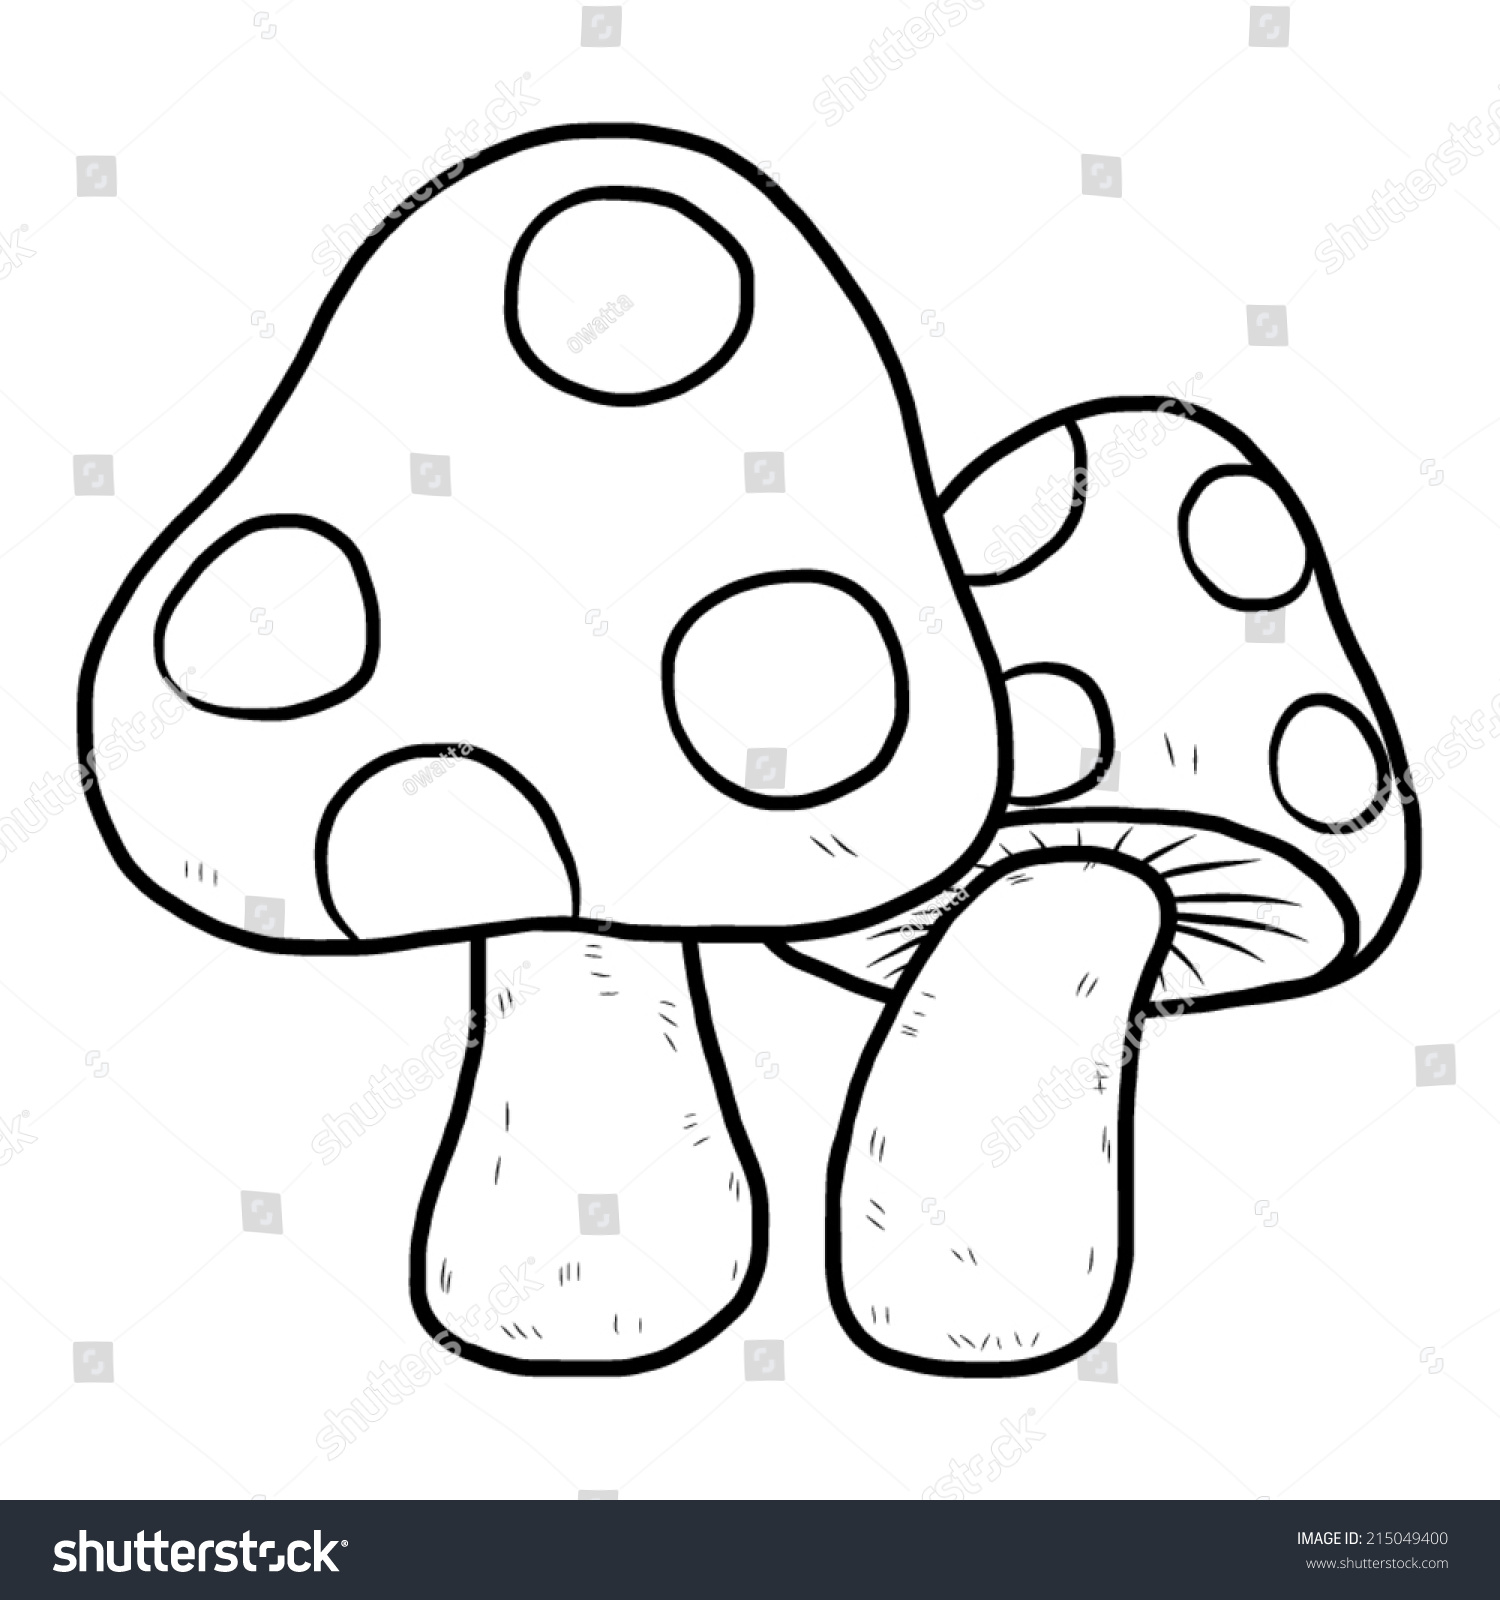 Mushroom Clipart Black And White